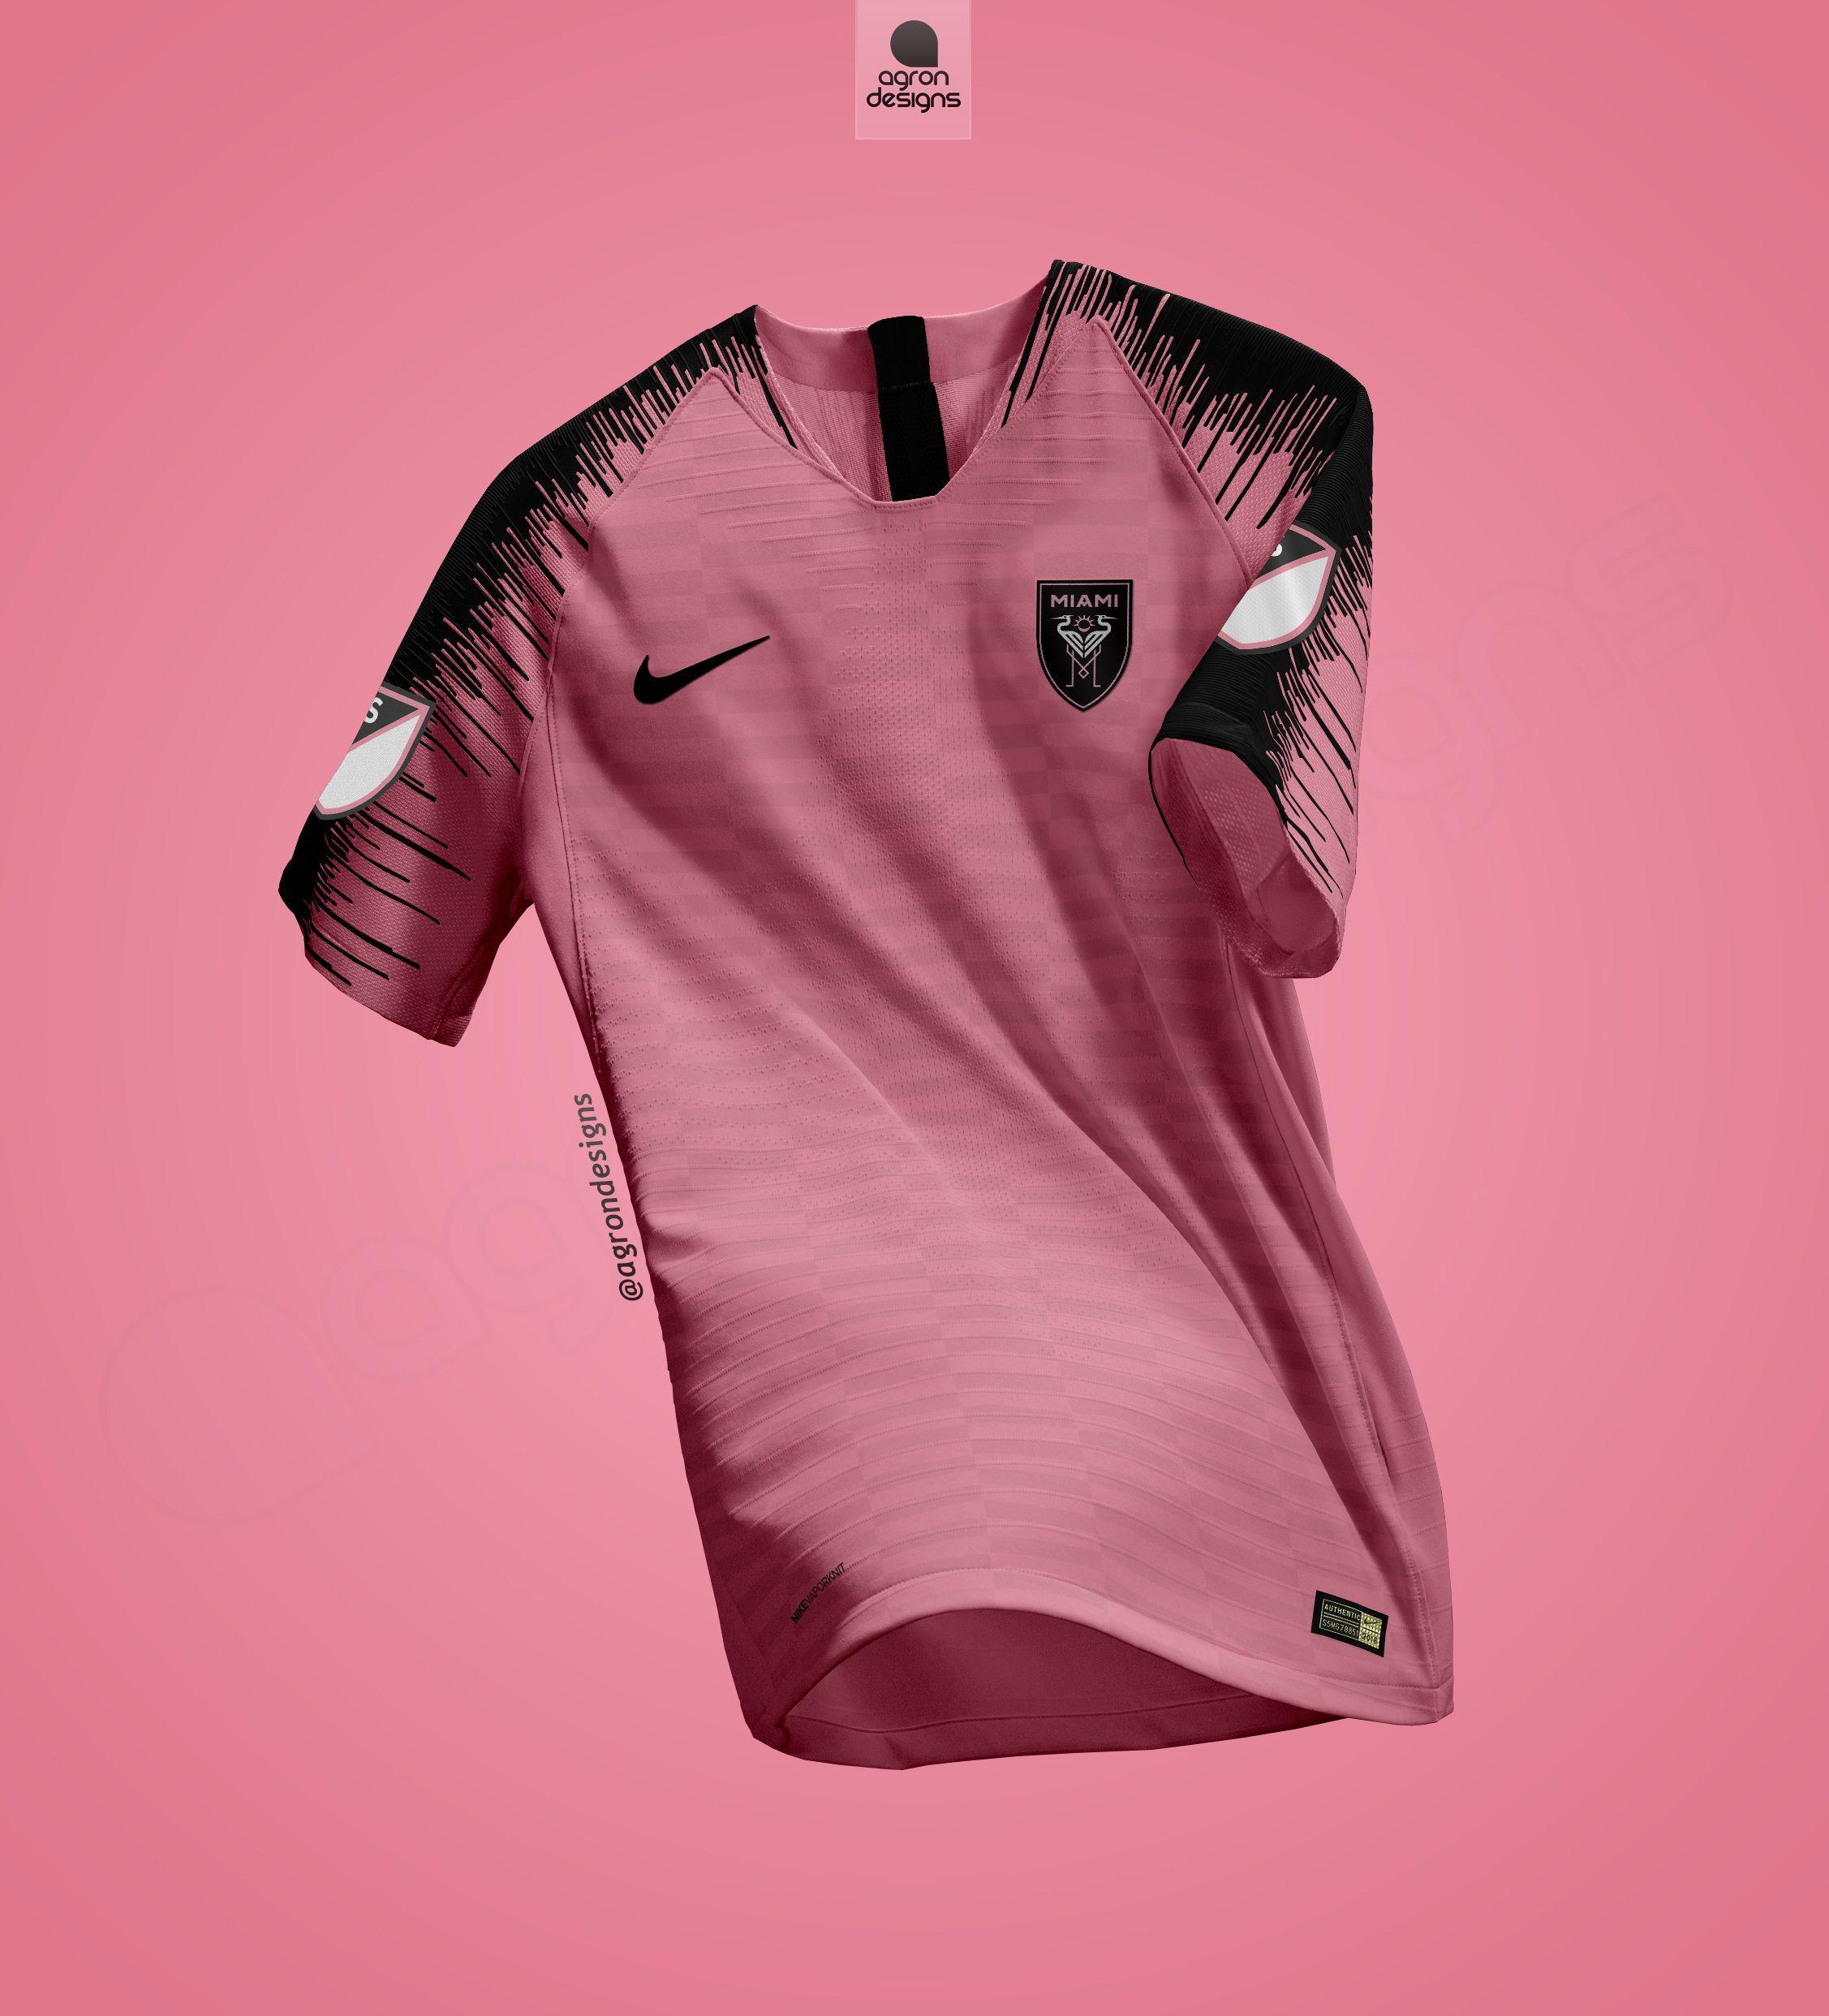 Related Image Esportes Camiseta Camisa